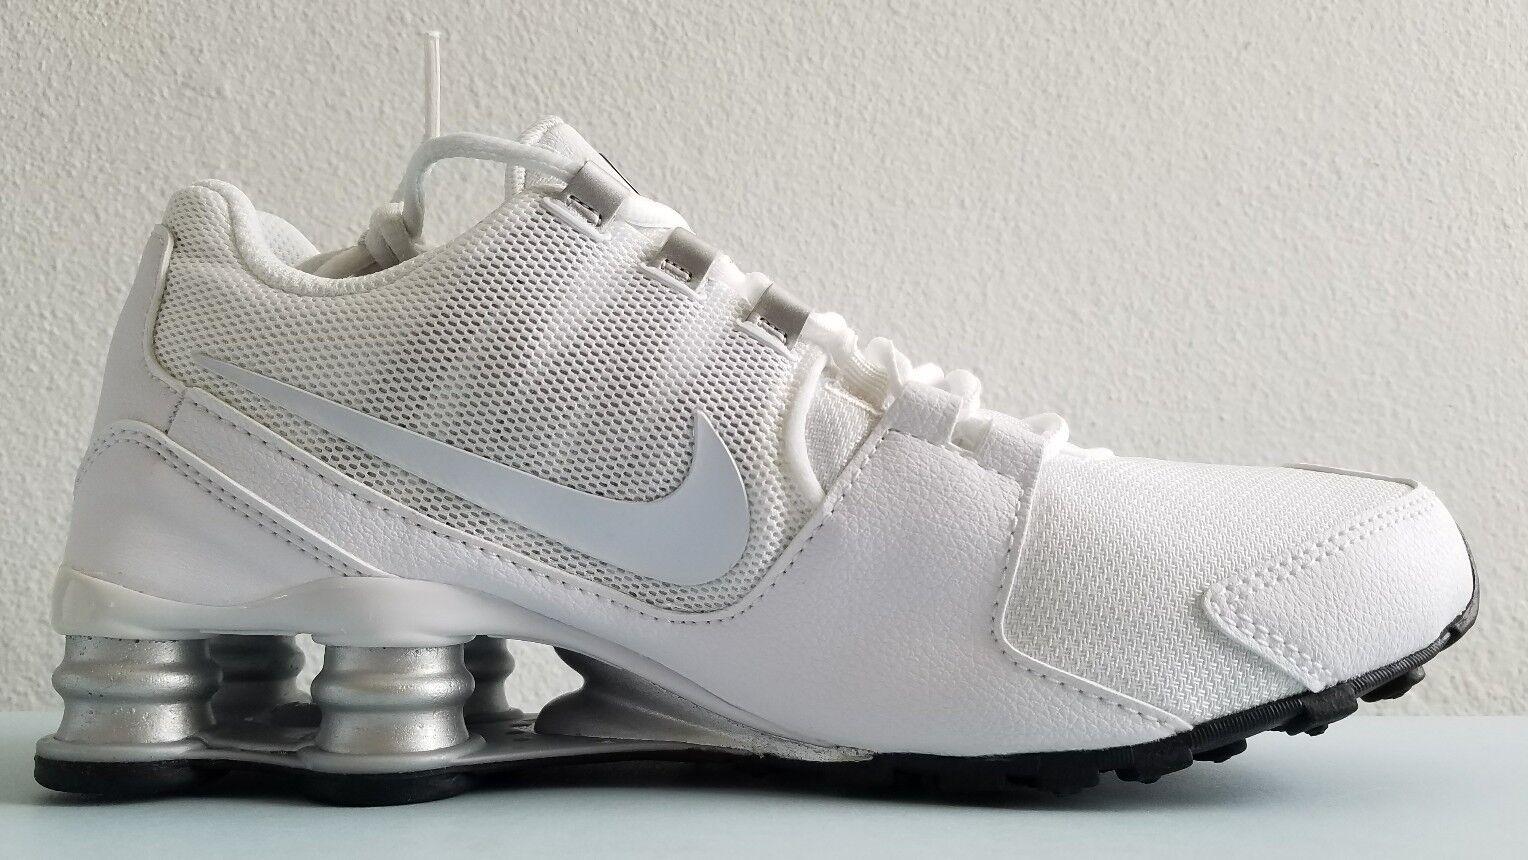 1a1f64309c5 Nike Shox Avenue Mens Mens Mens Running White Silver-Black Nike 833583 101  Size 7.5 New fbe0b6